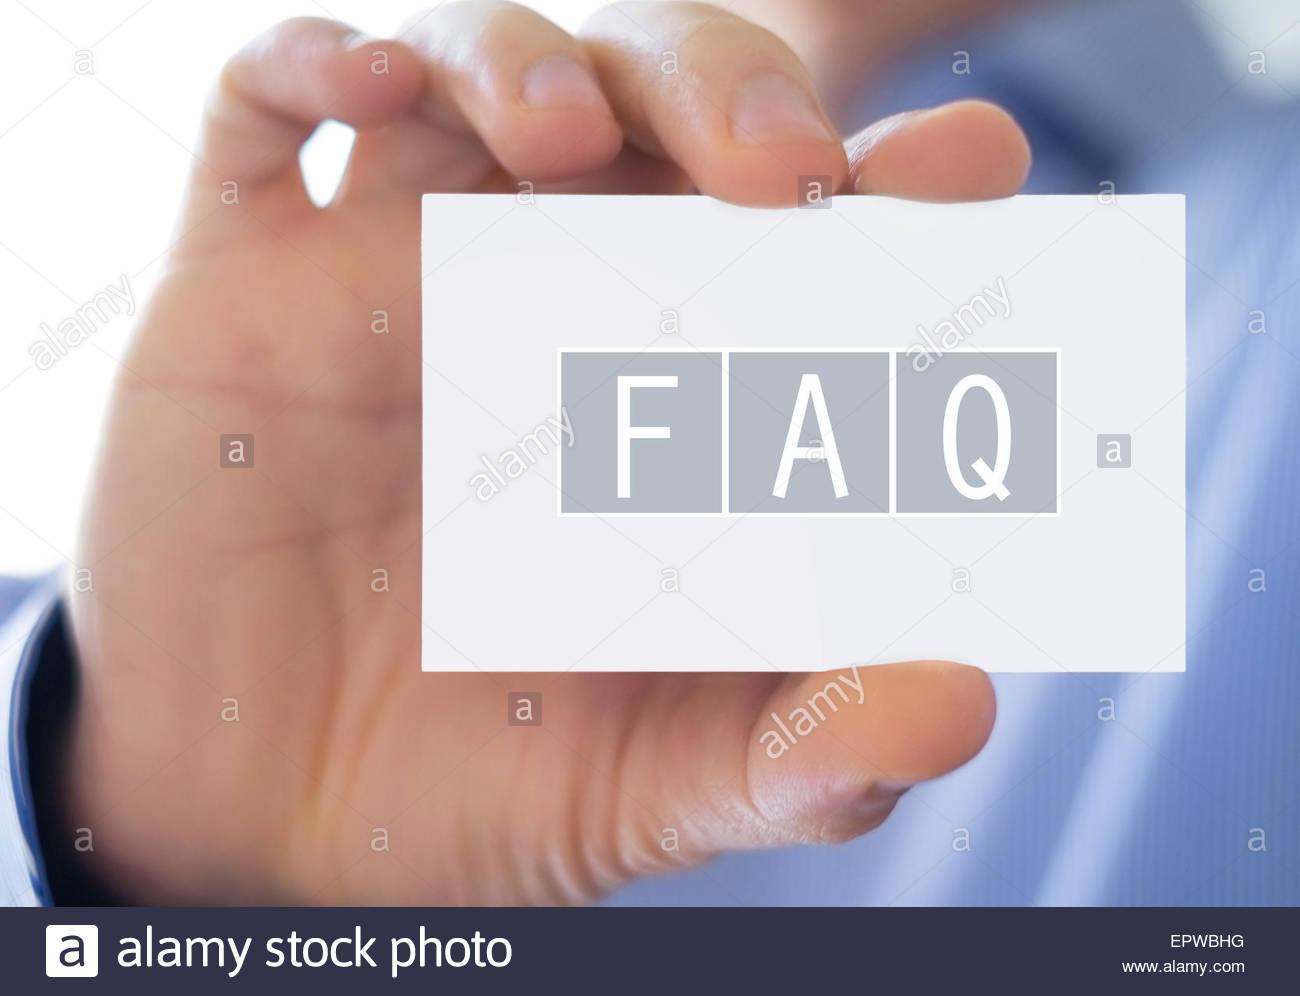 FAQ - häufig gestellte Fragen Stockbild